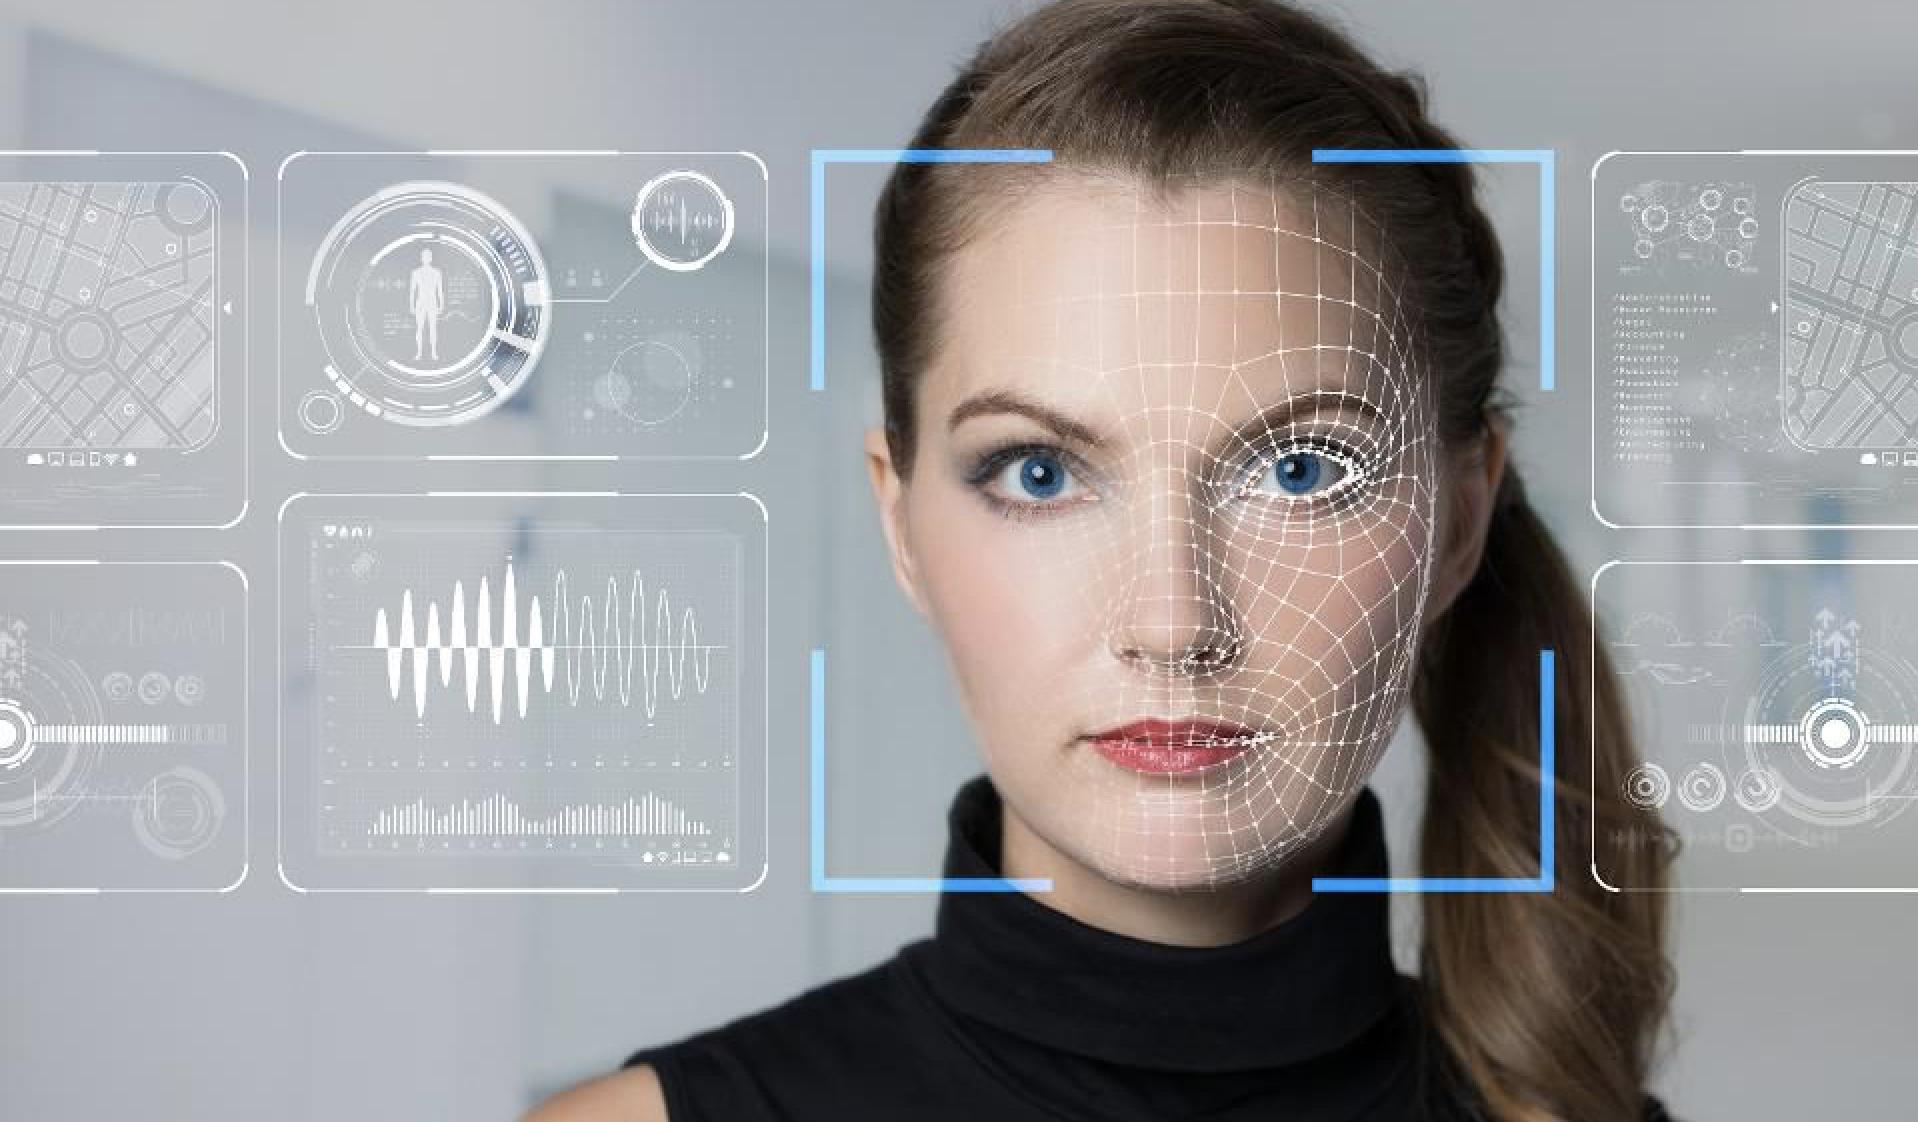 Biometrics As User Control AR VR XR